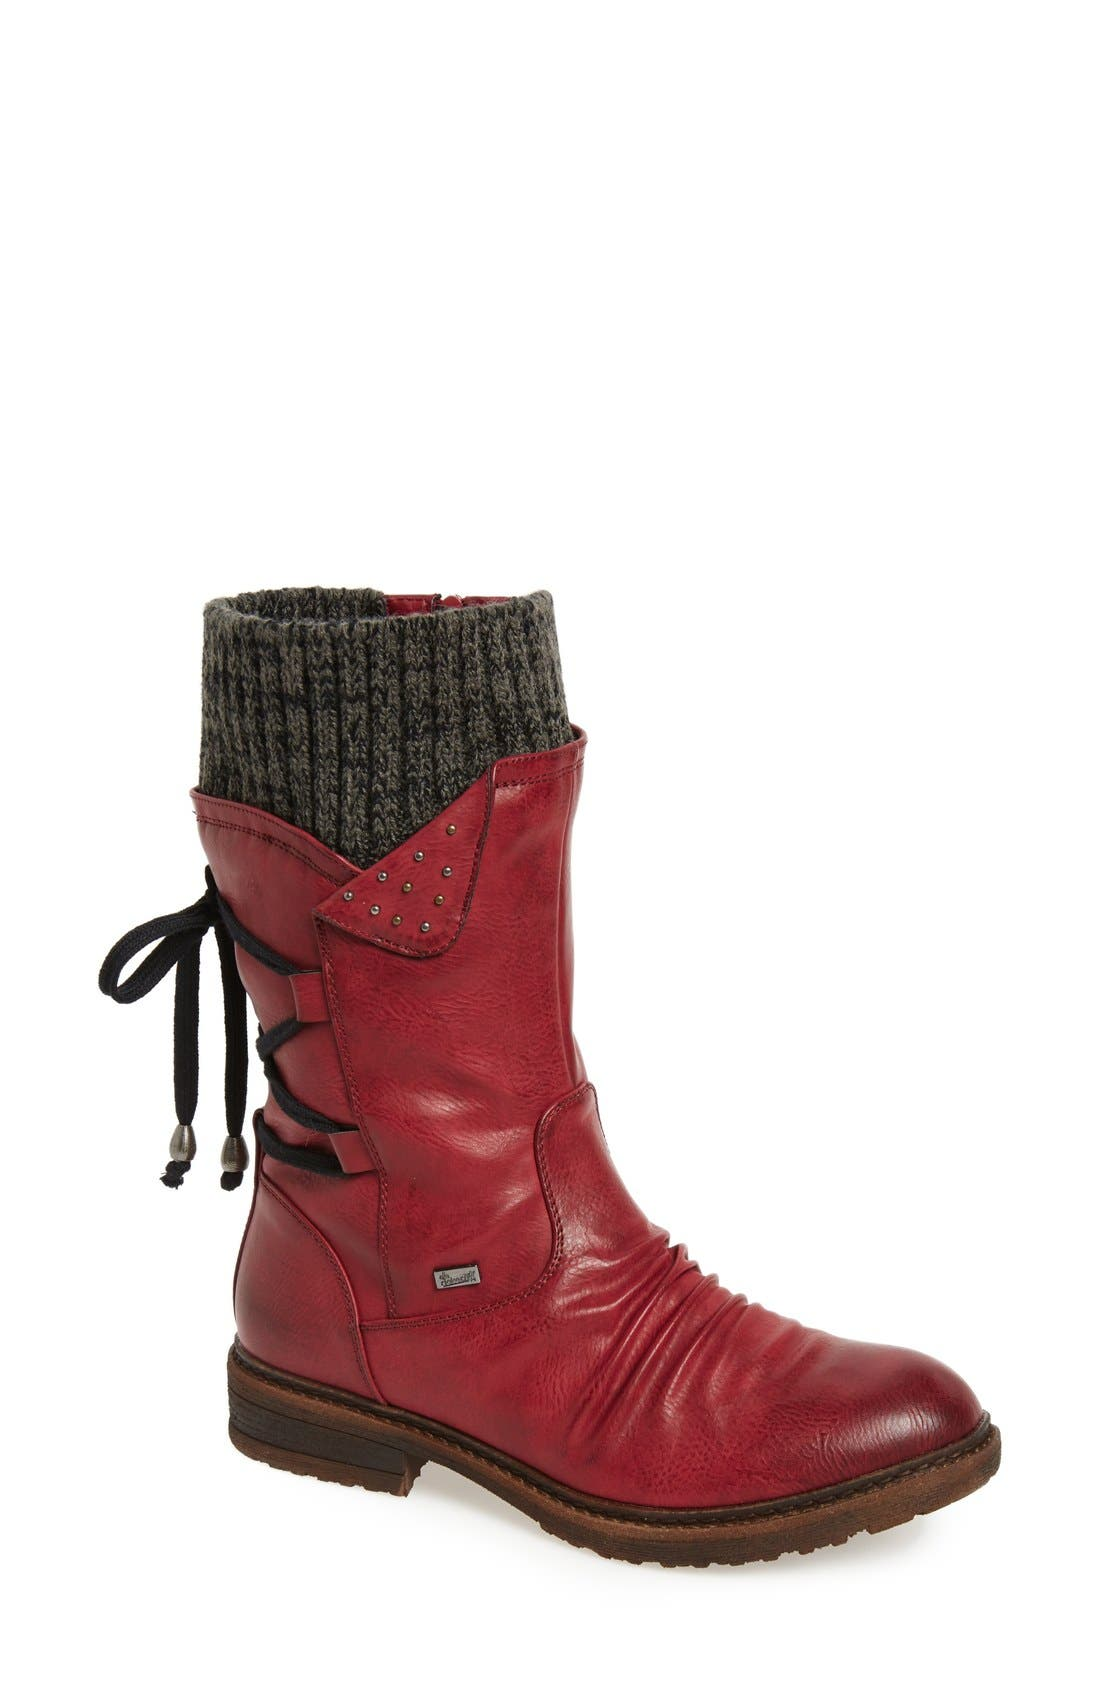 Alternate Image 1 Selected - Rieker Antistress Dominika 73 Water Resistant Boot (Women)